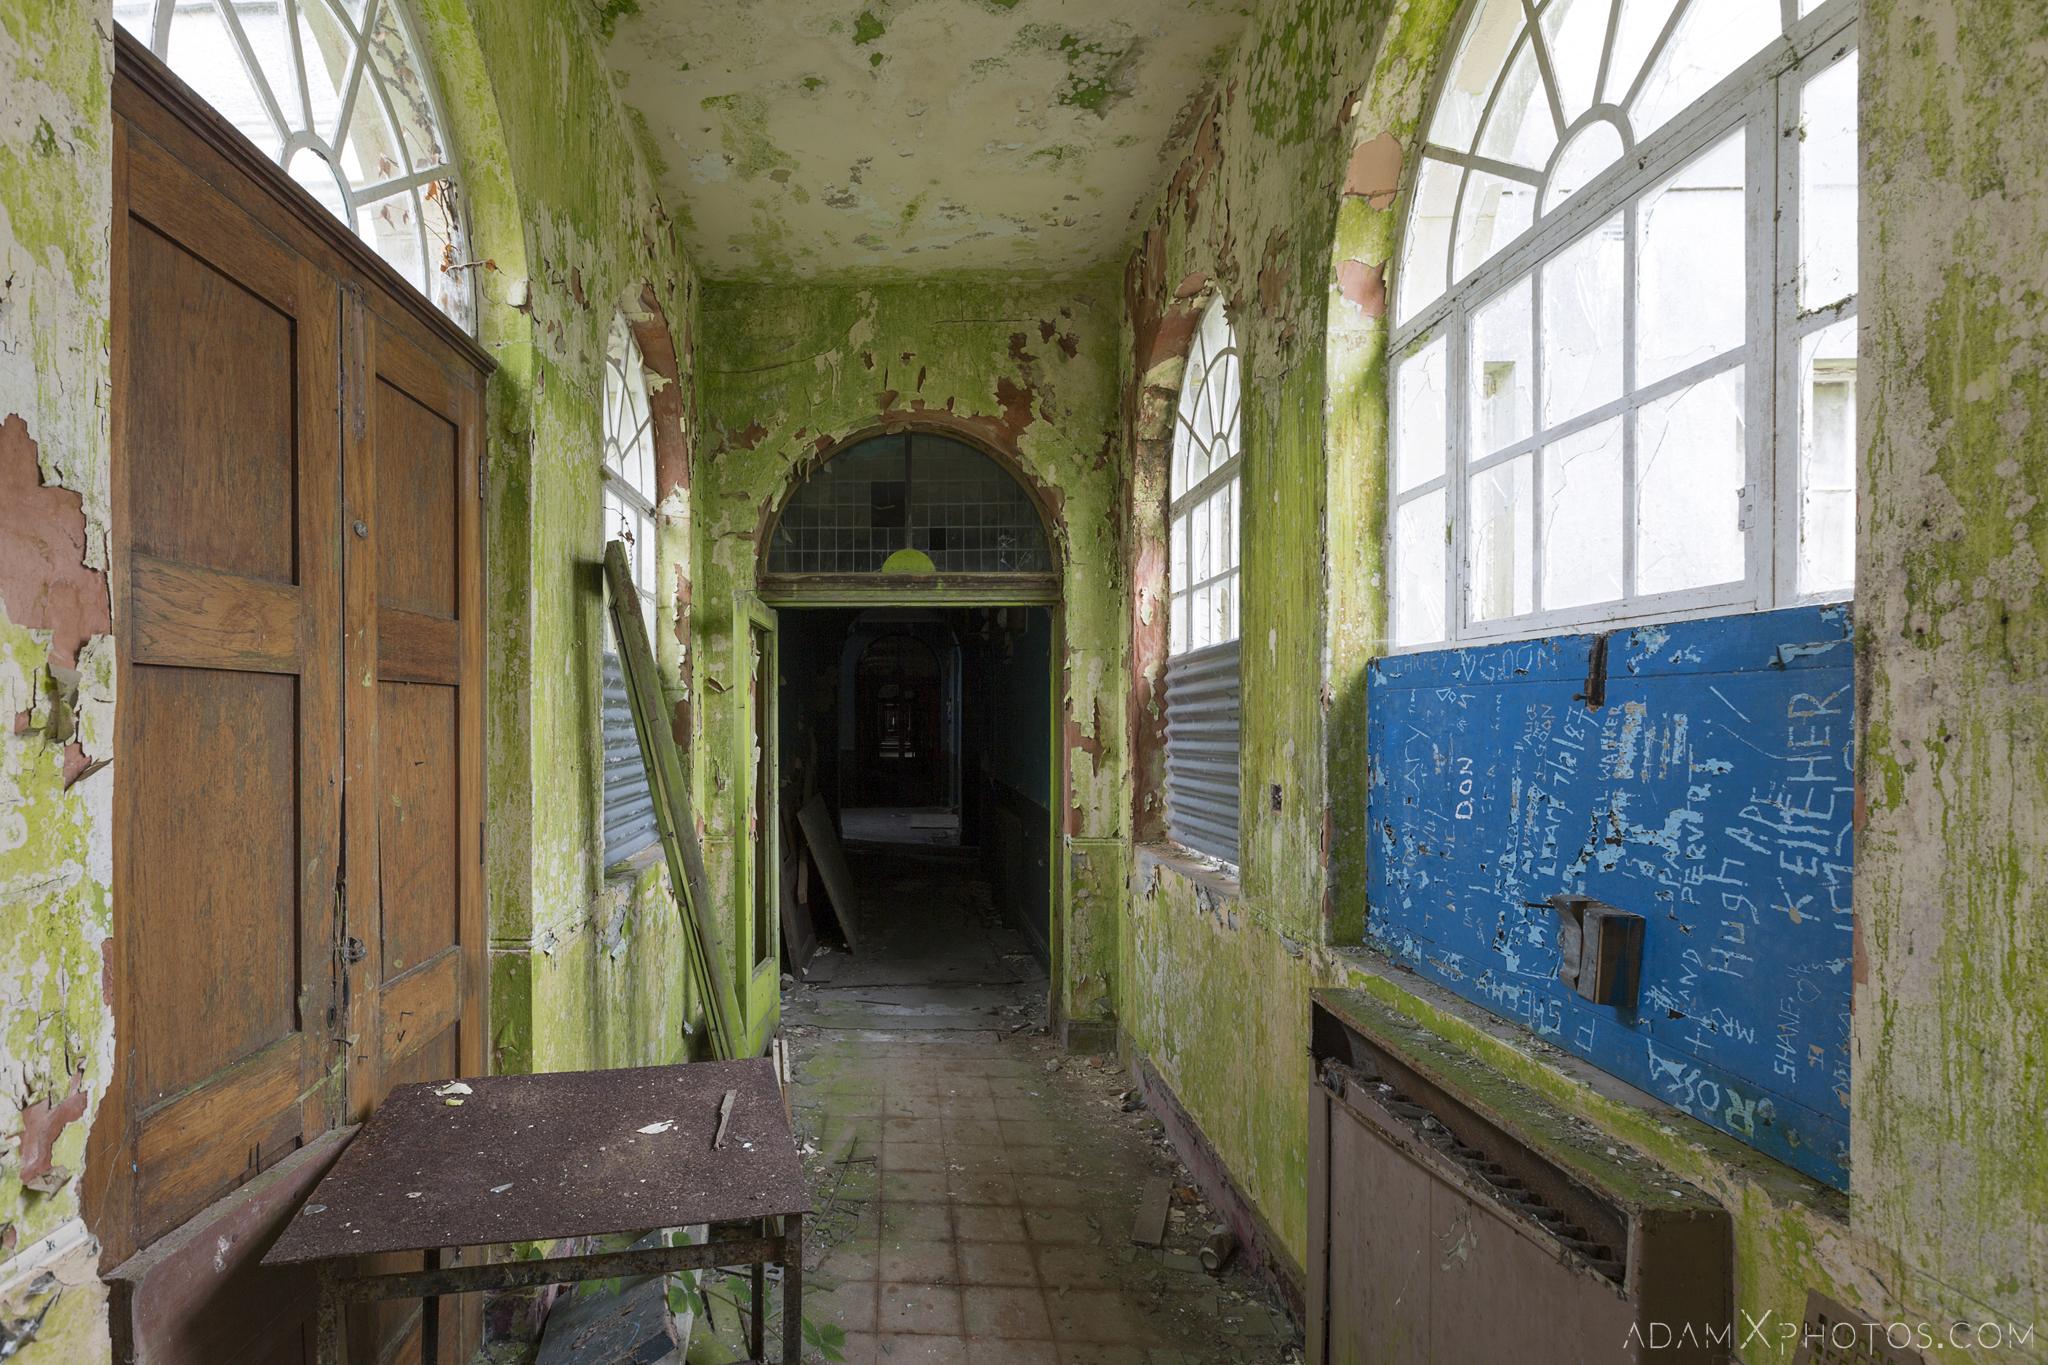 green corridor trashed De Salle College School Colaiste Iosagain Ballyvourney County Cork Adam X Urbex Urban Exploration Ireland Access 2017 Abandoned decay lost forgotten derelict location creepy haunting eerie